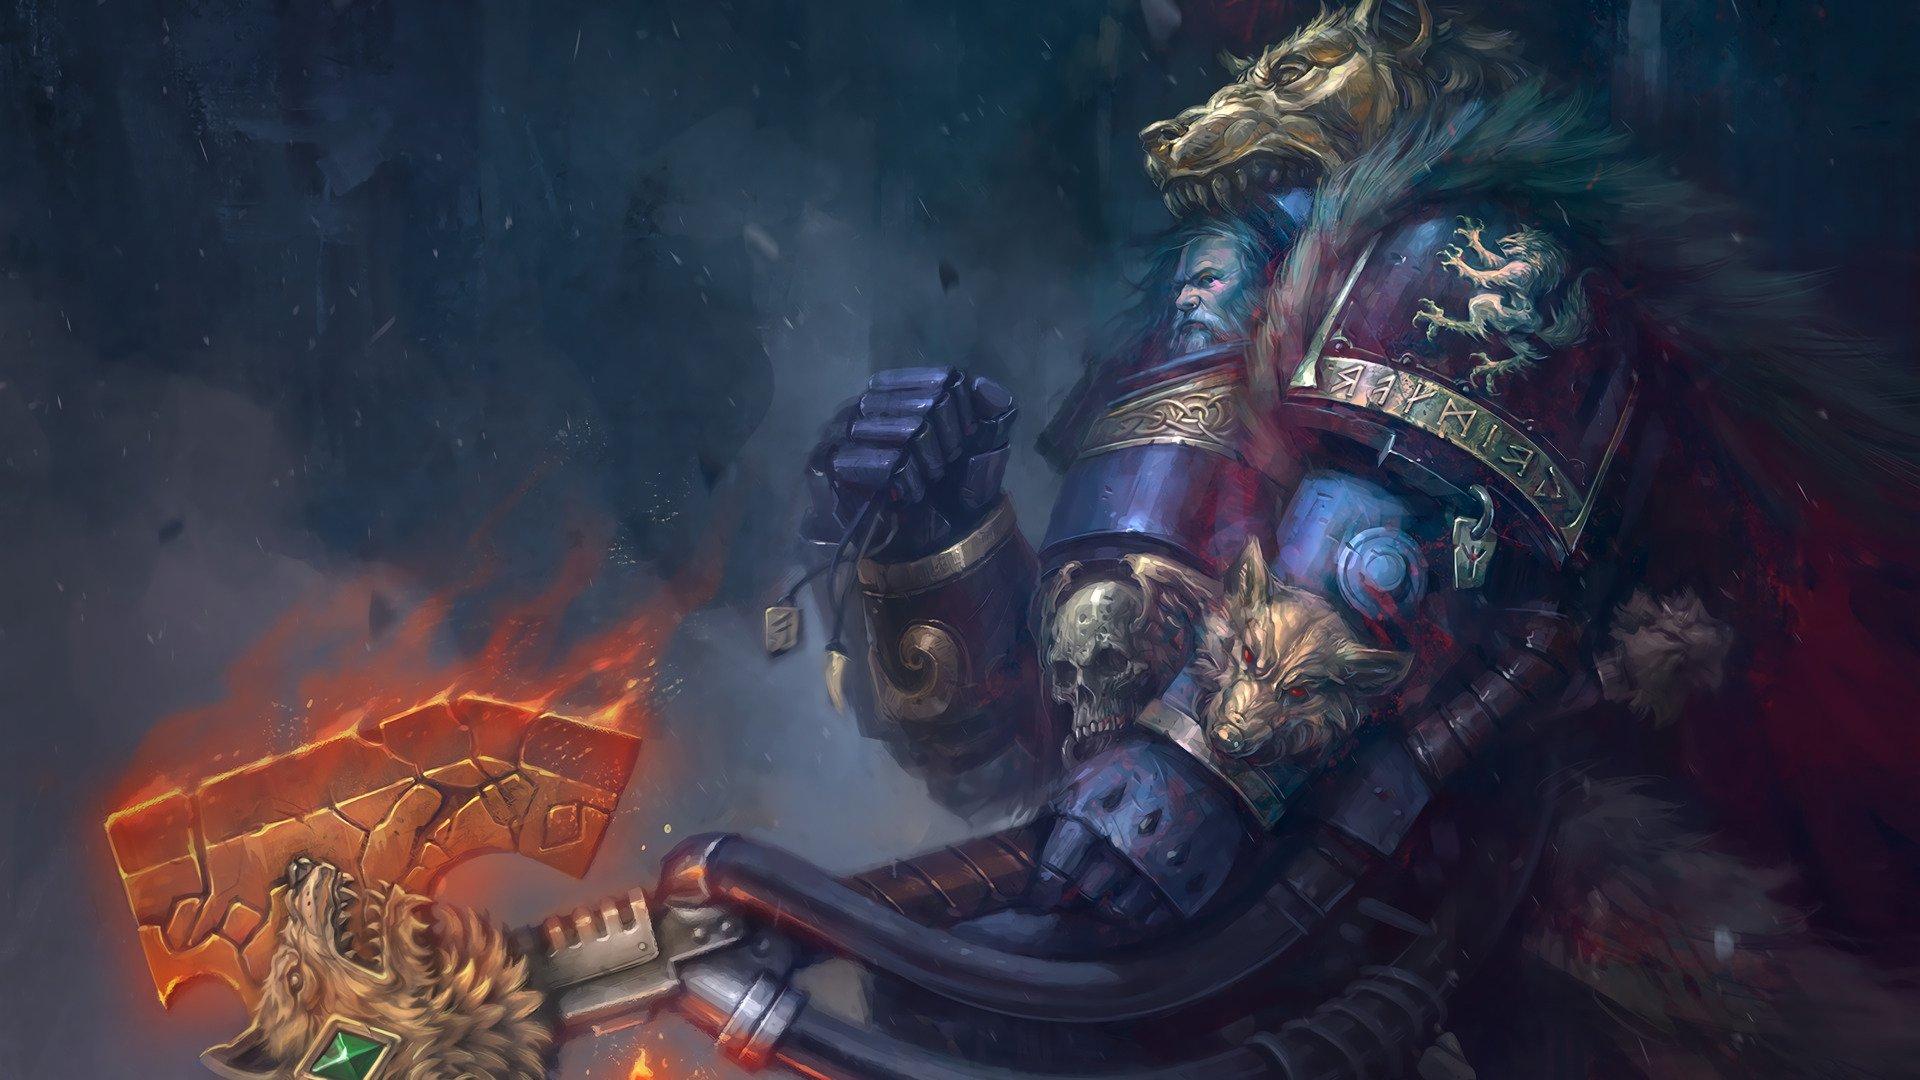 Logan Grimnar Warhammer 40 000 Space Marines Hd Wallpapers